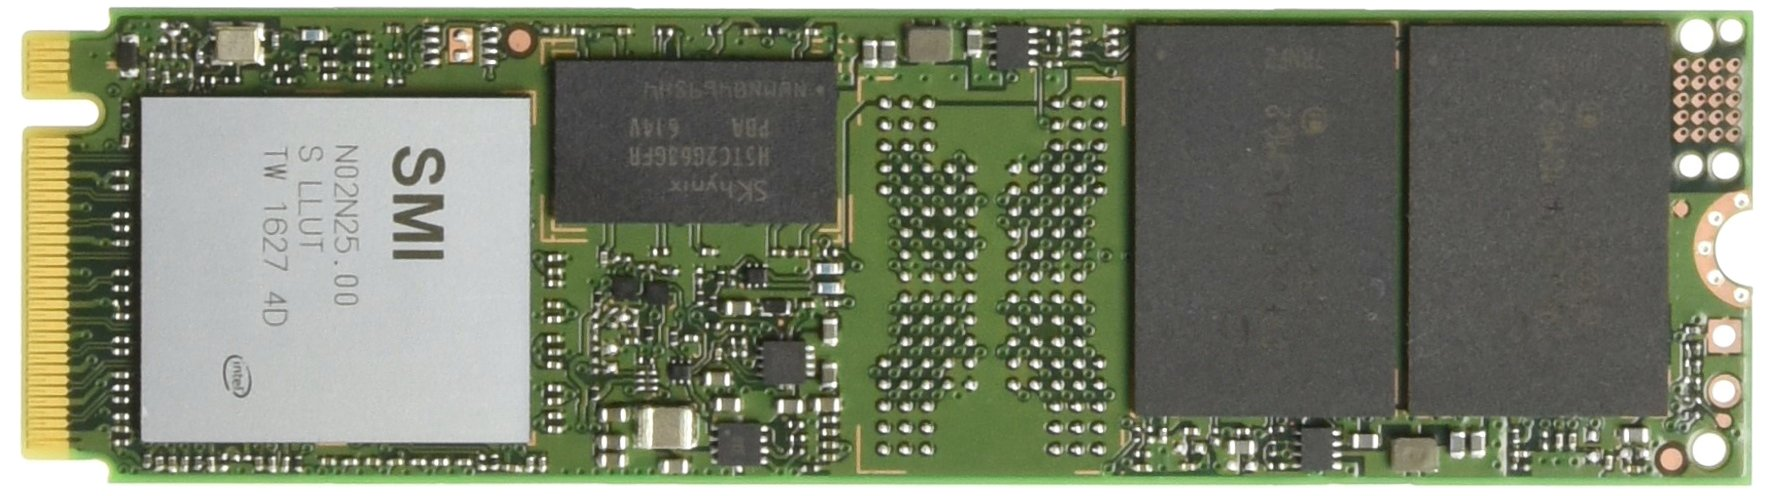 M.2 2280 128GB NVME Intel 600p Series PEKKW128G7X1 128GB M.2